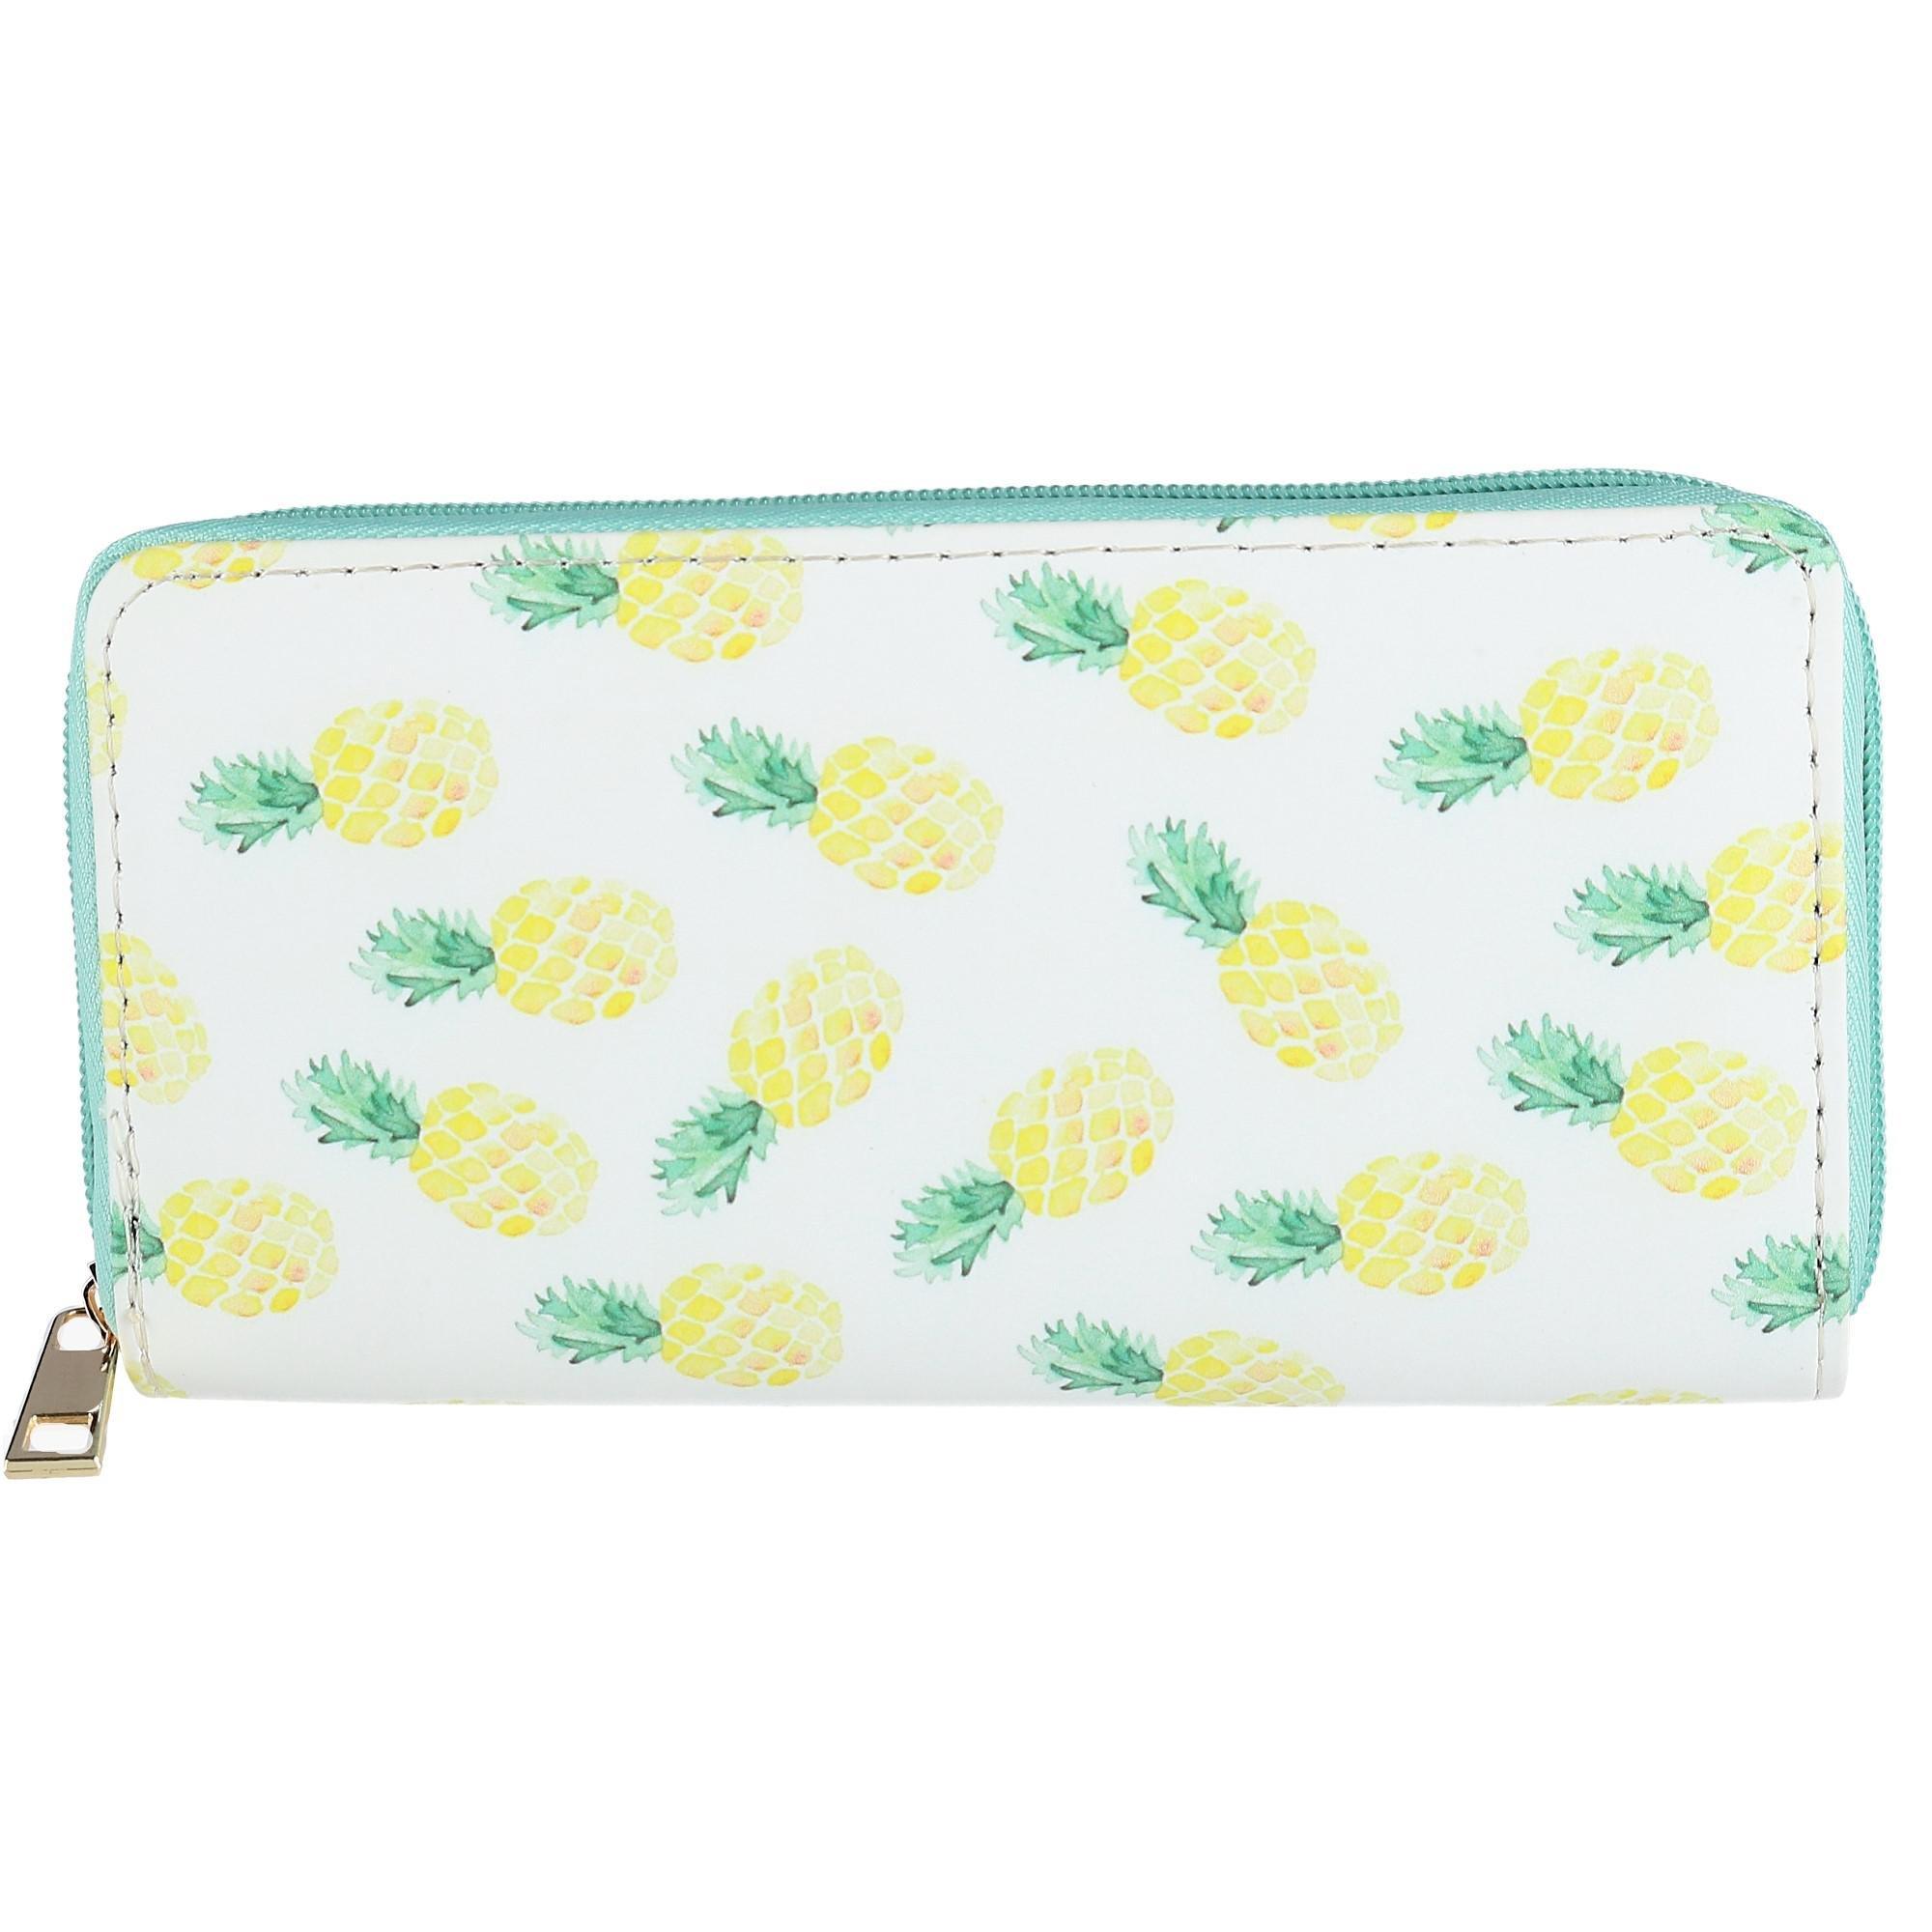 CTM Women's Zip-Around Pineapple Print Wallet, White